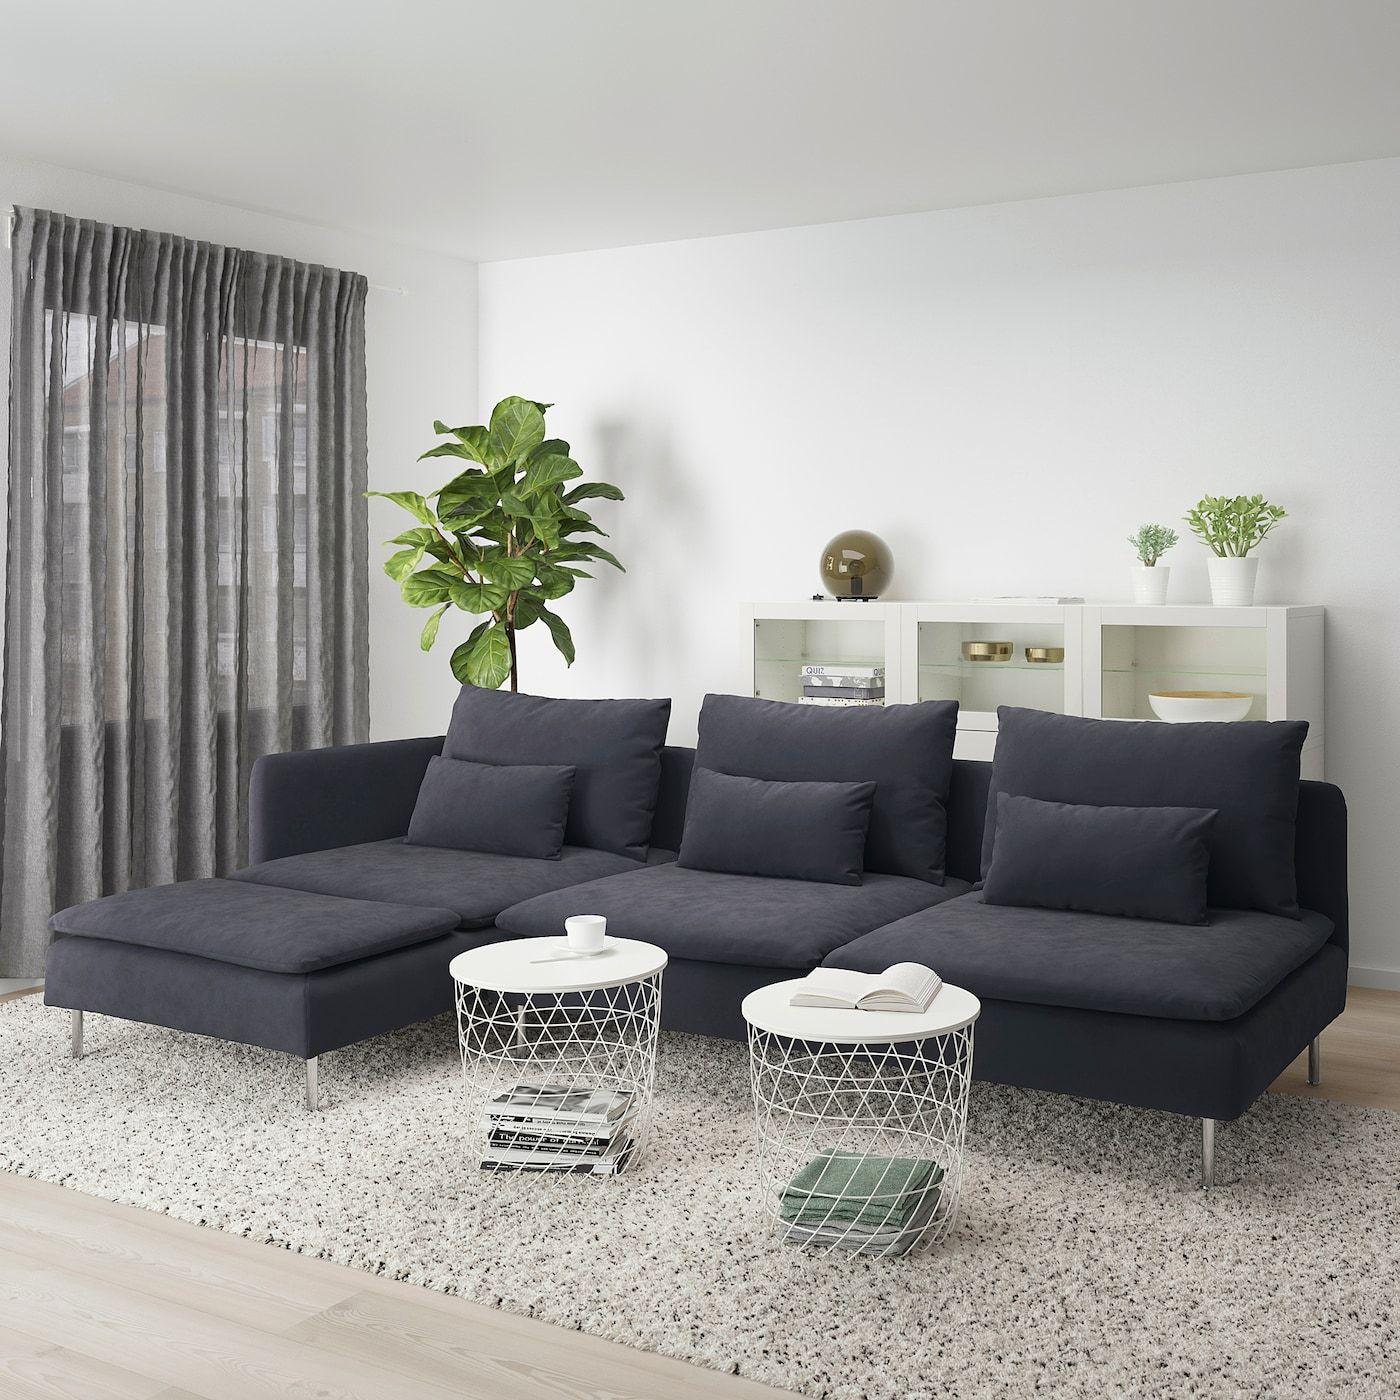 Soderhamn 4er Sofa Mit Recamiere Offenes Ende Samsta Dunkelgrau Ikea Deutschland Dark Grey Couch Living Room Comfortable Sofa Ikea Couch